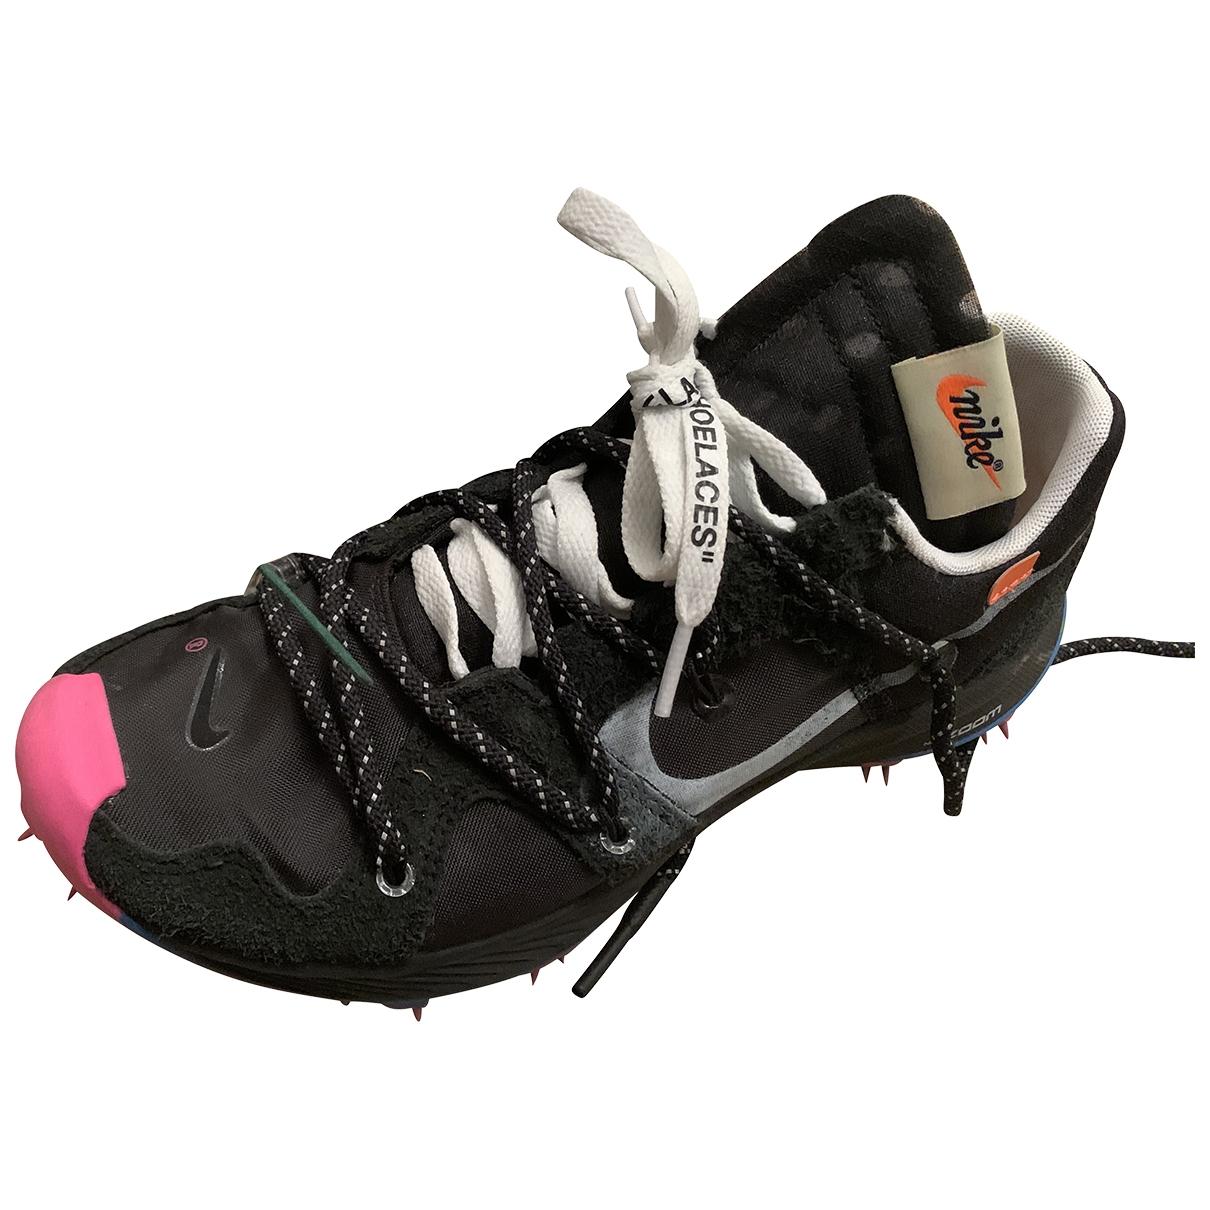 Deportivas Zoom Terra Kiger 5 de Lona Nike X Off-white